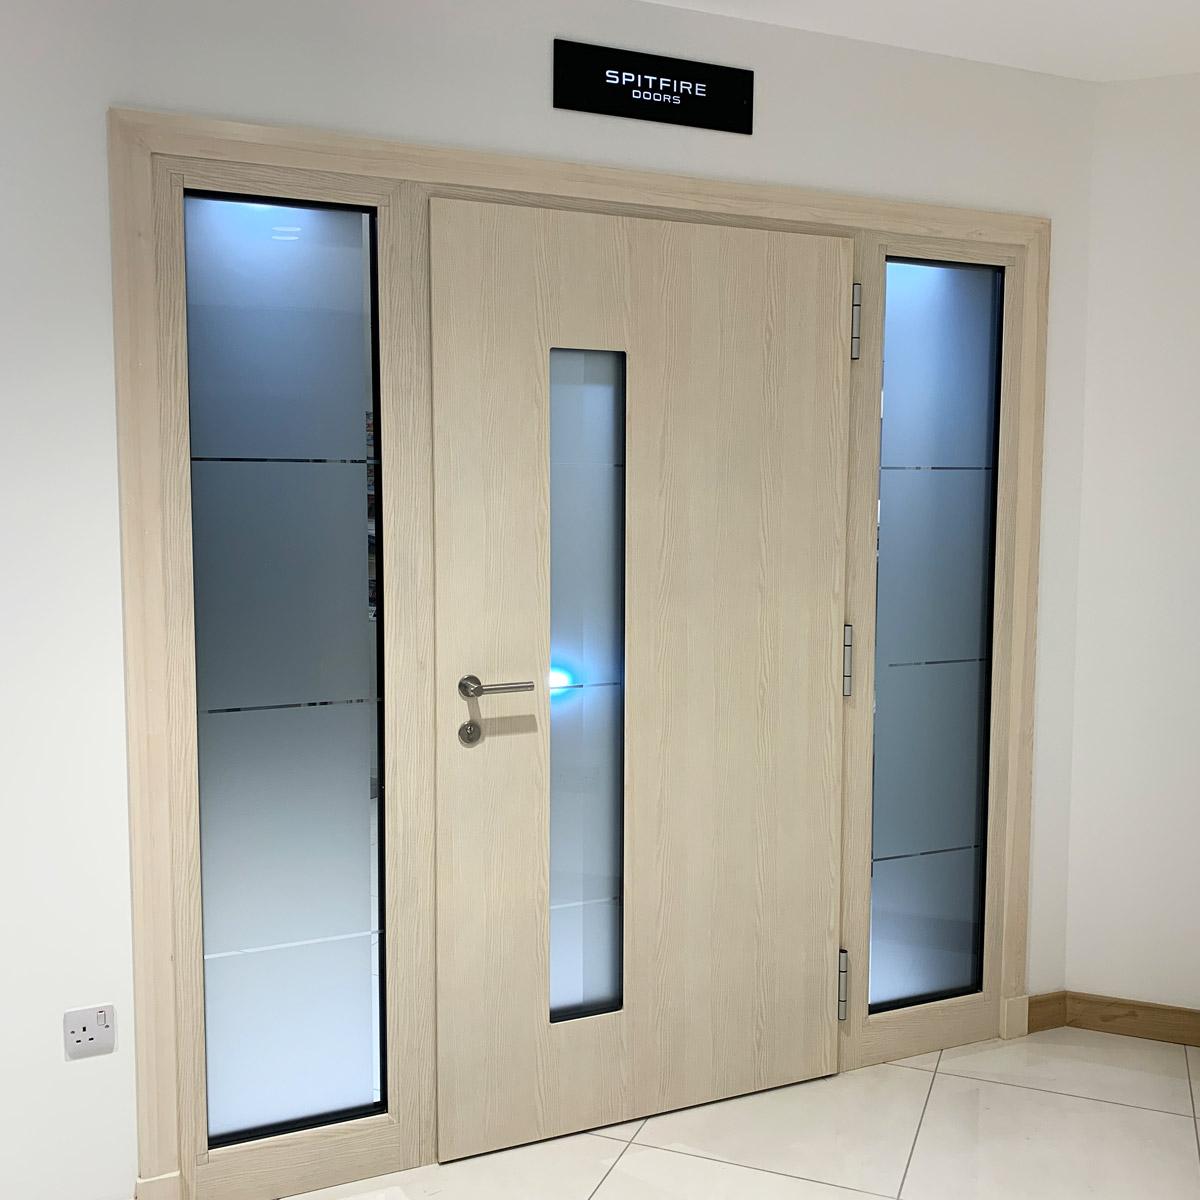 Thistle Windows & Conservatories: Spitfire Aluminium Doors